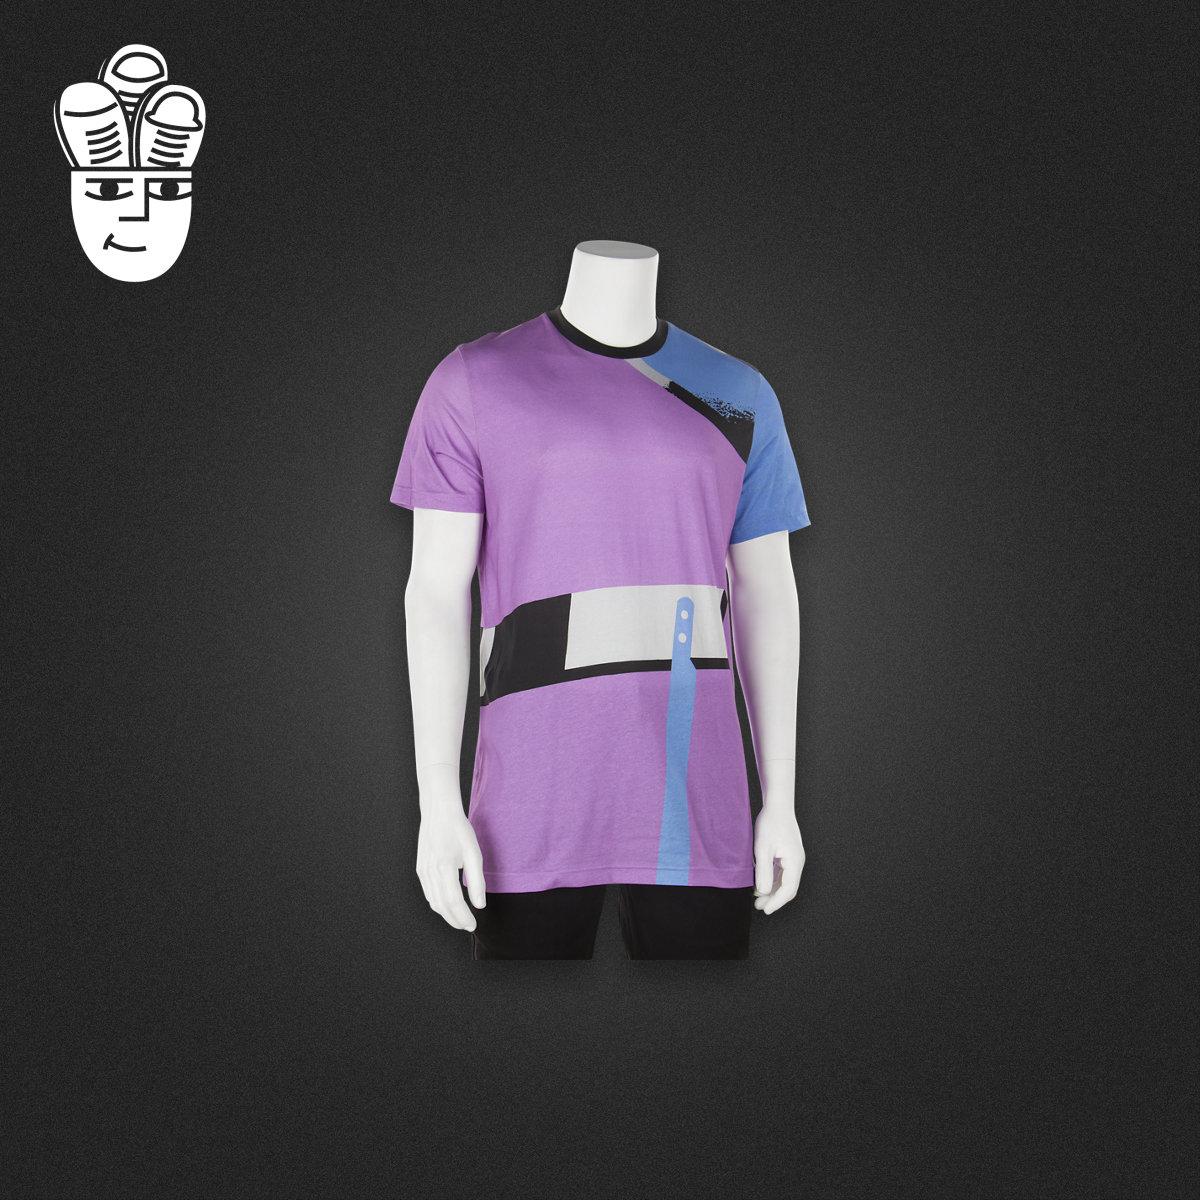 Adidas Archive Catalog 阿迪达斯男子T恤衫 运动休闲拼接短袖